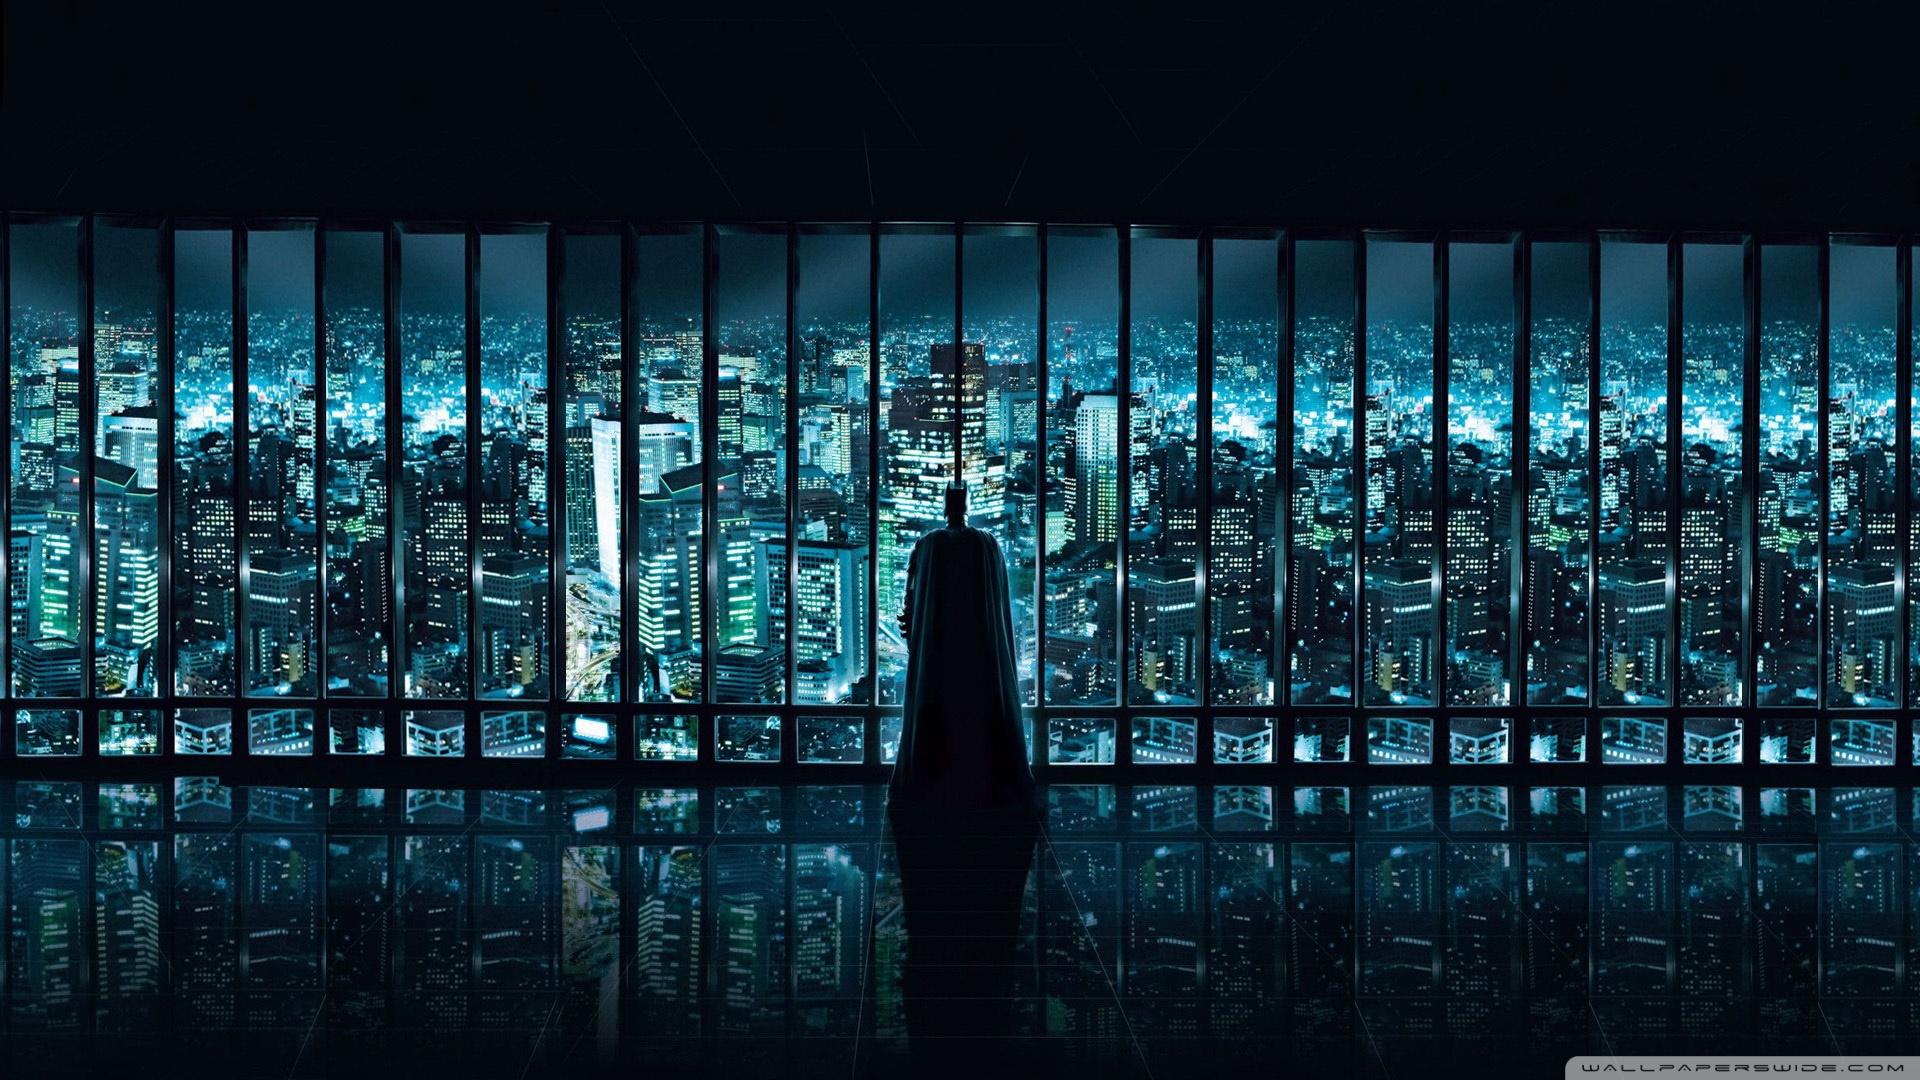 Batman Wallpaper Why Do We Fall Batman 4k Hd Desktop Wallpaper For 4k Ultra Hd Tv Wide